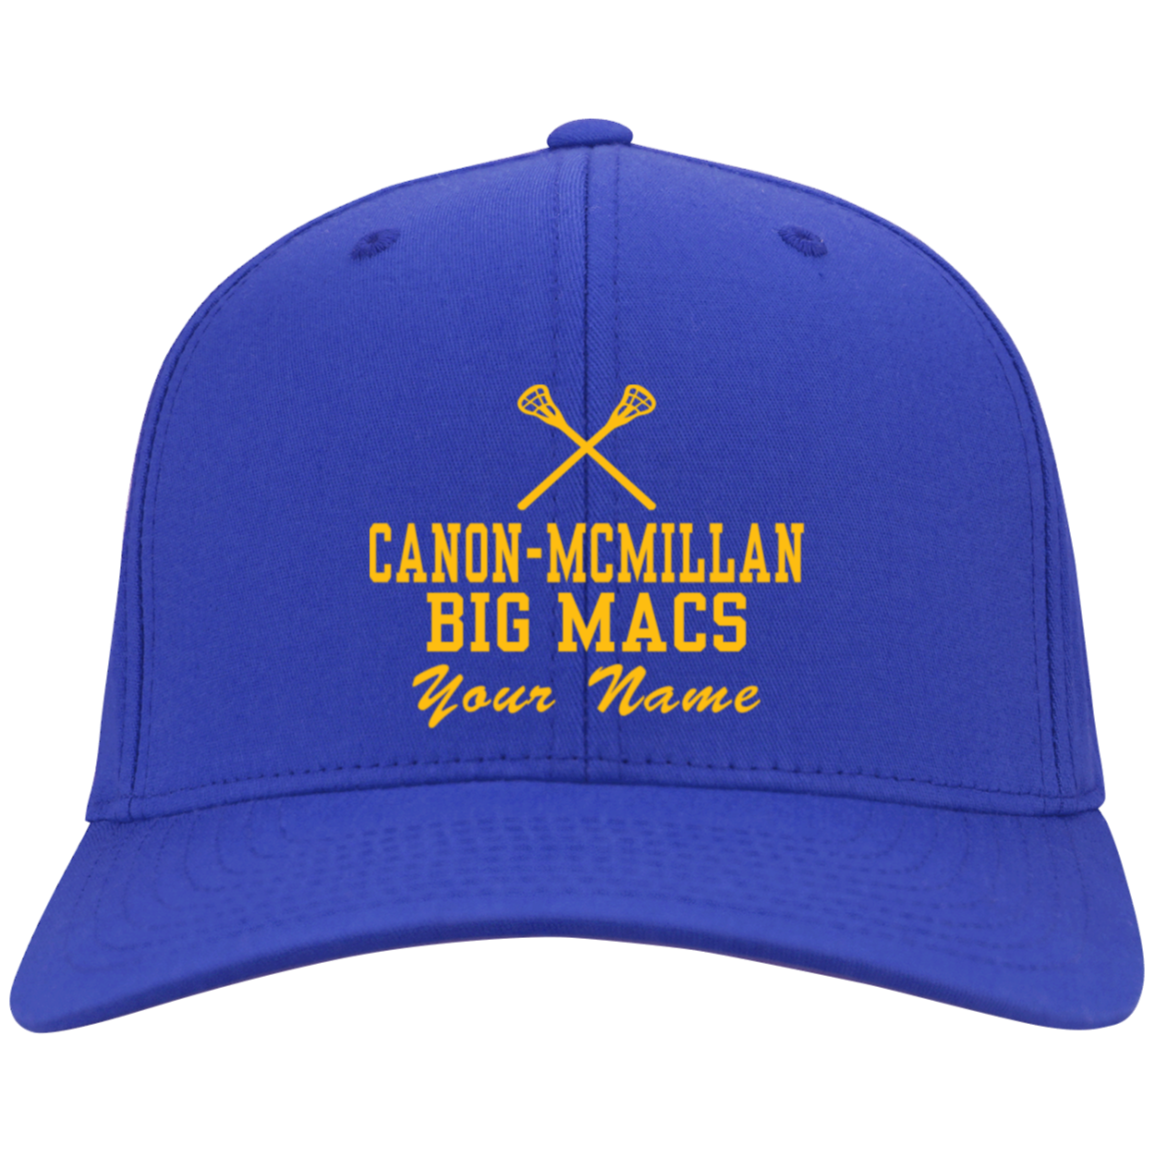 27e75526b Canon-McMillan Senior High School Flex Fit Twill Baseball Cap -  SpiritShop.com